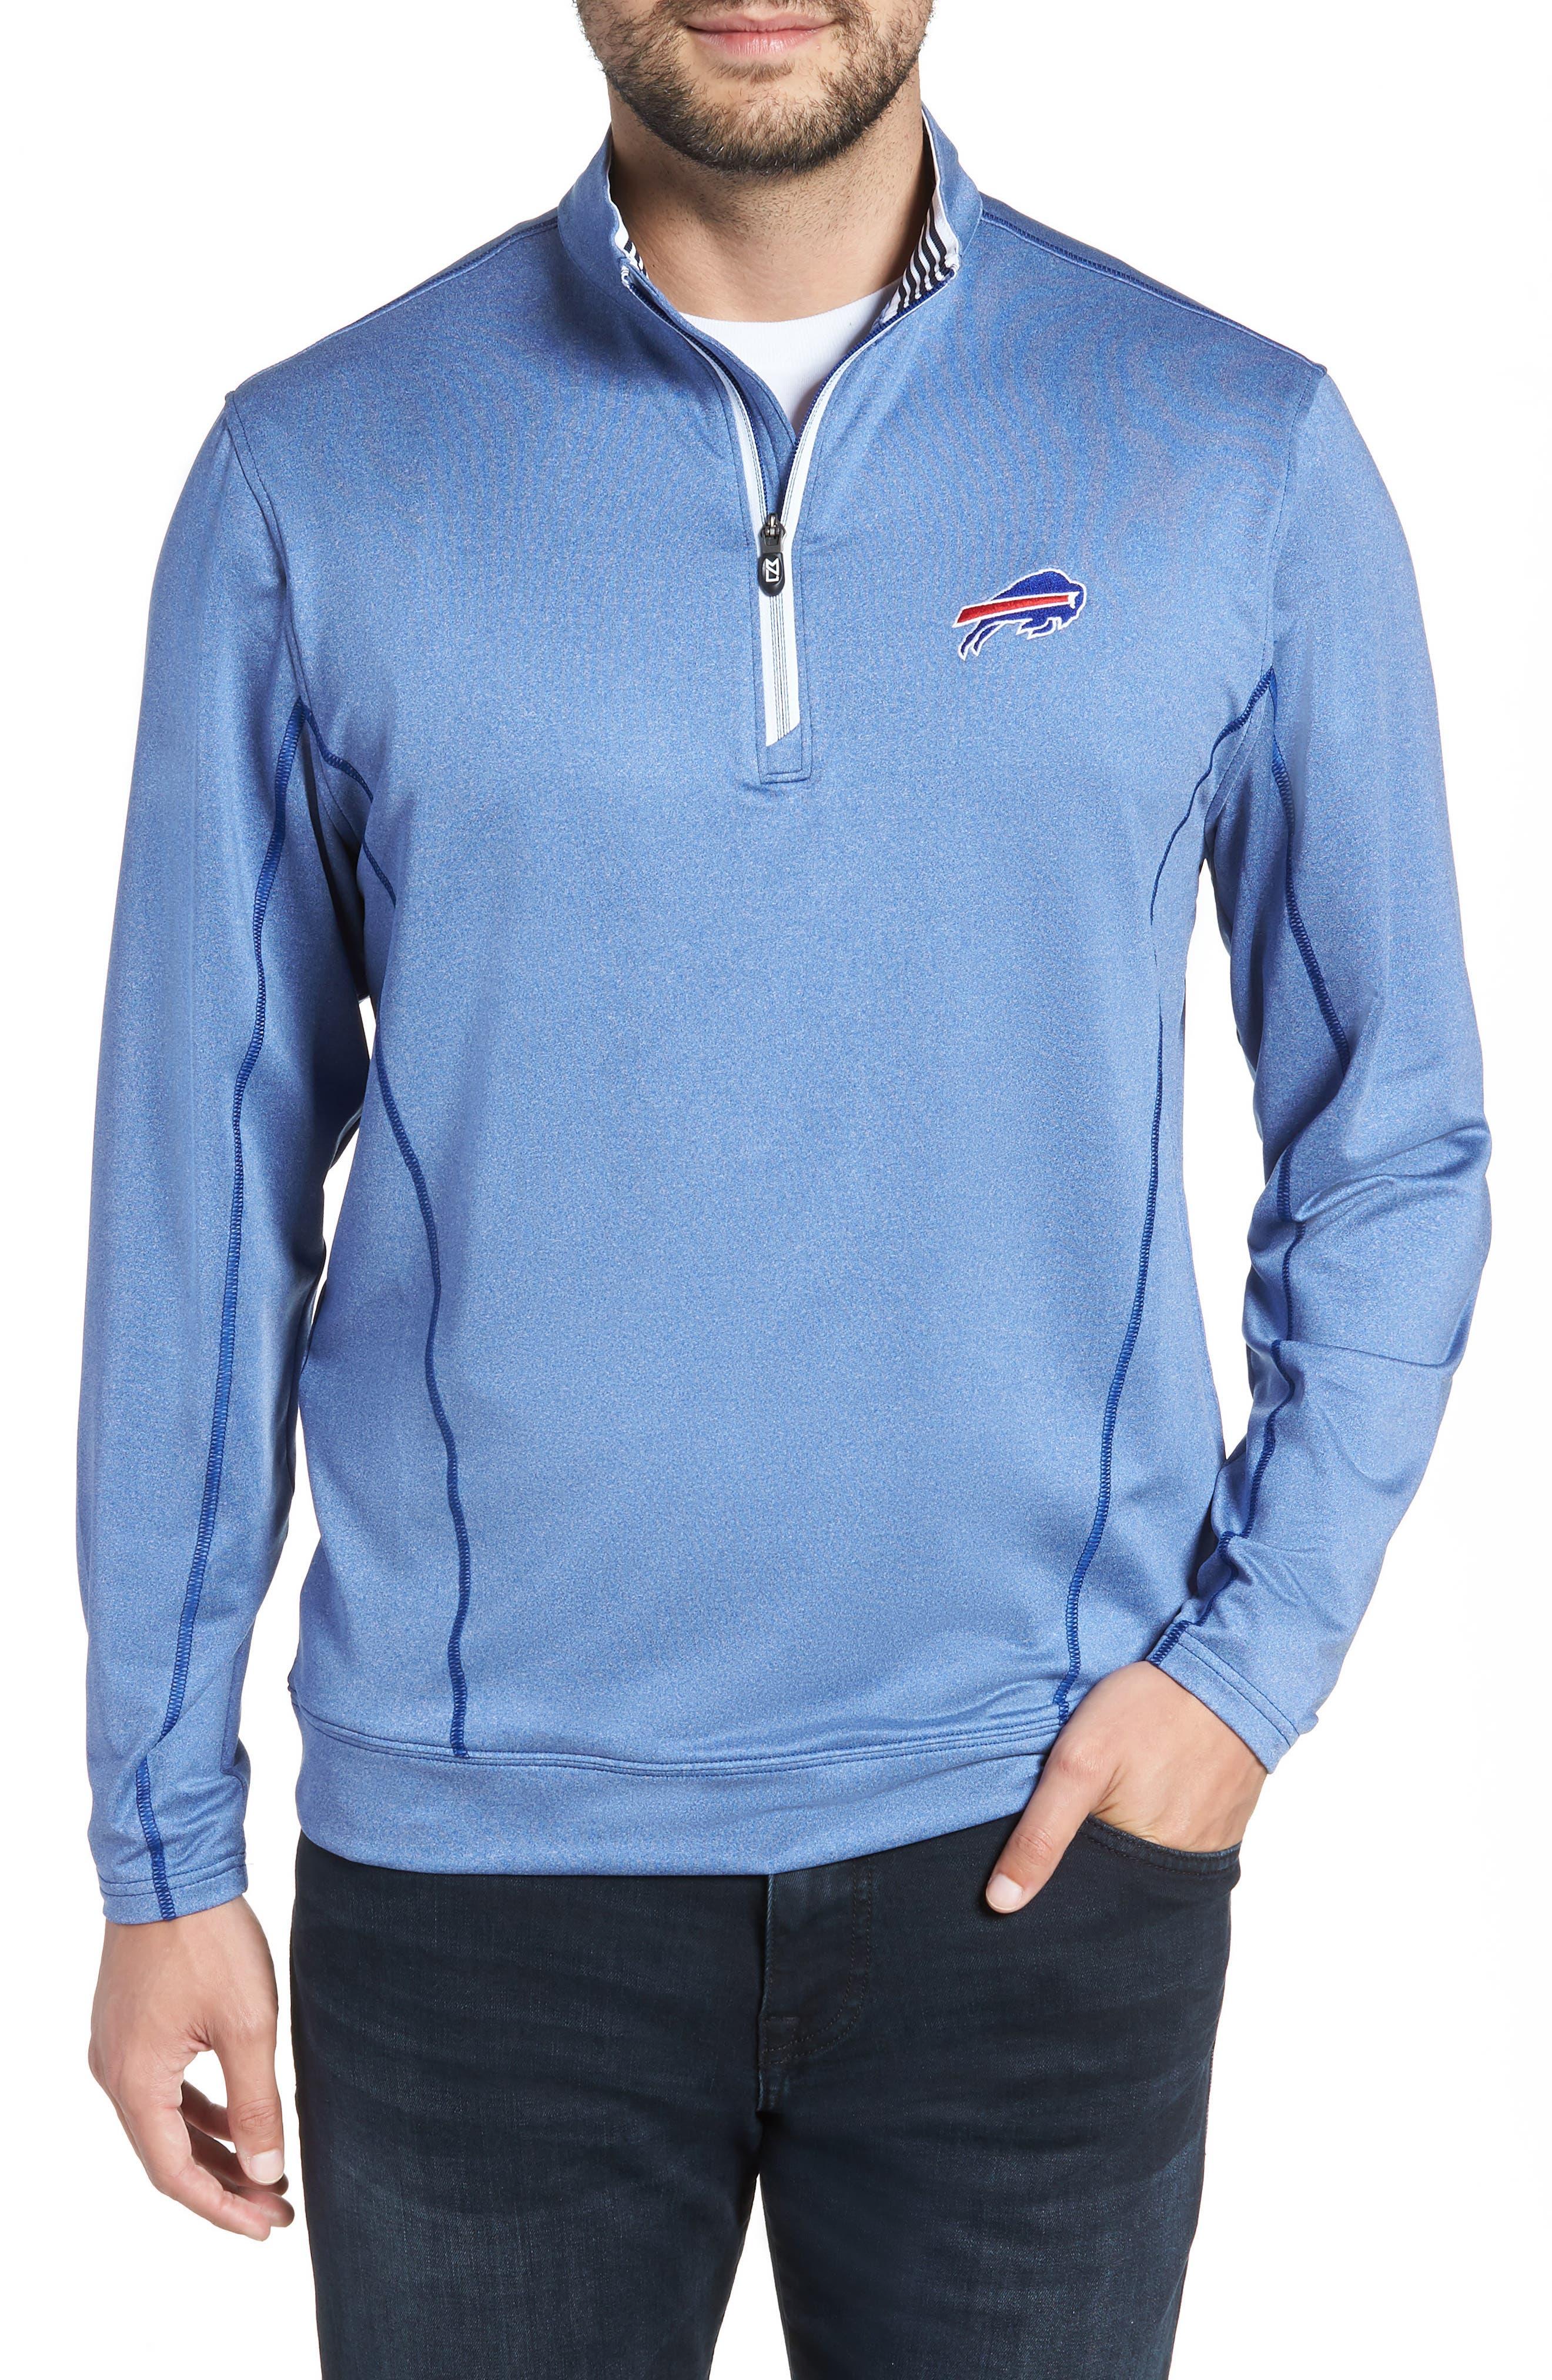 Endurance Buffalo Bills Regular Fit Pullover,                             Main thumbnail 1, color,                             TOUR BLUE HEATHER